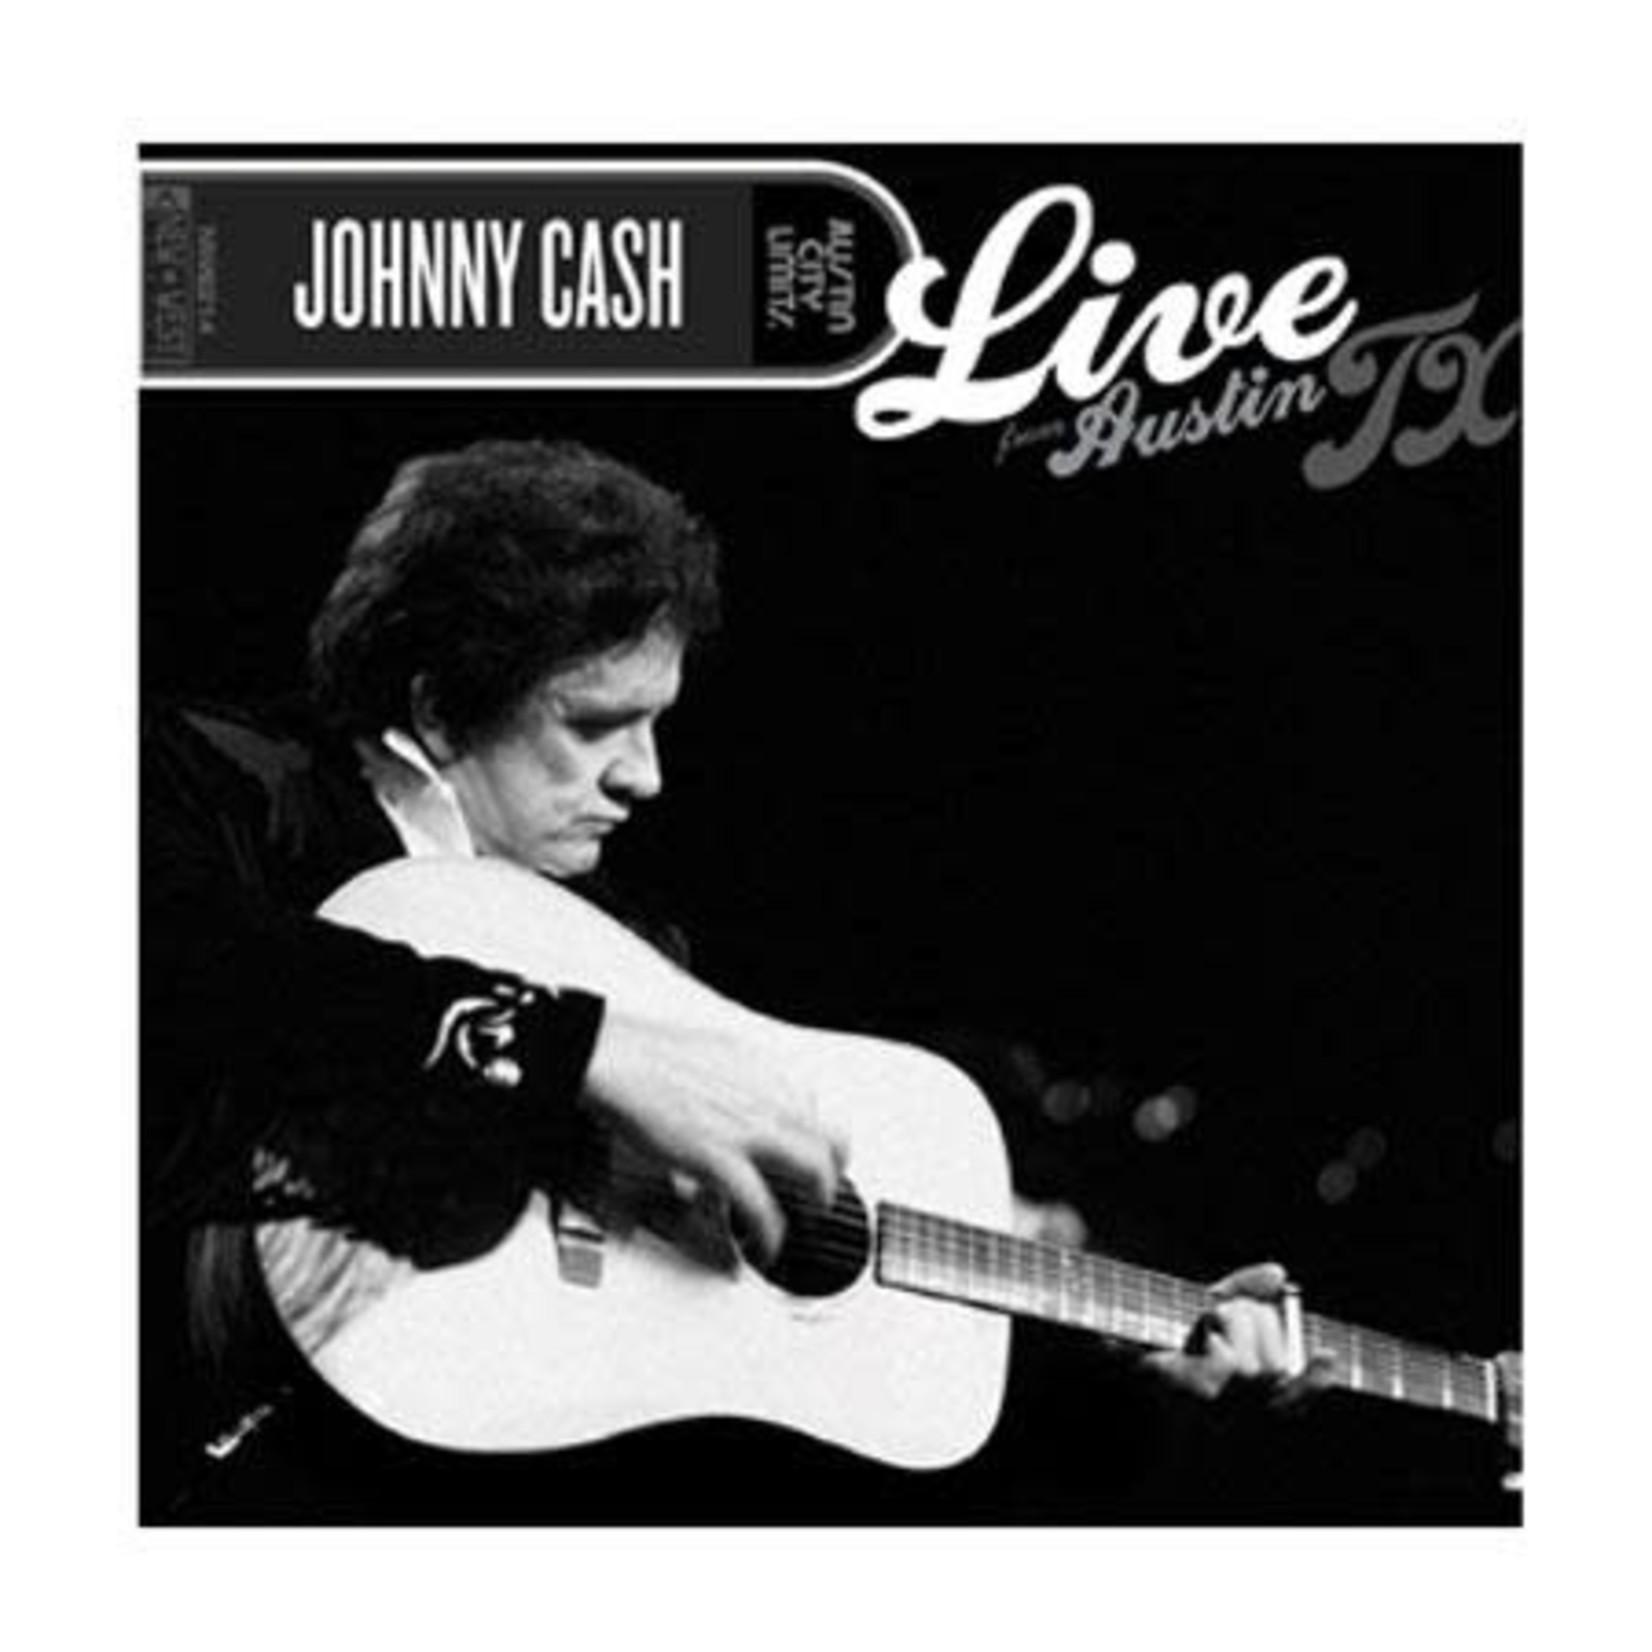 JOHNNY CASH LIVE FROM AUSTIN, TX  LP